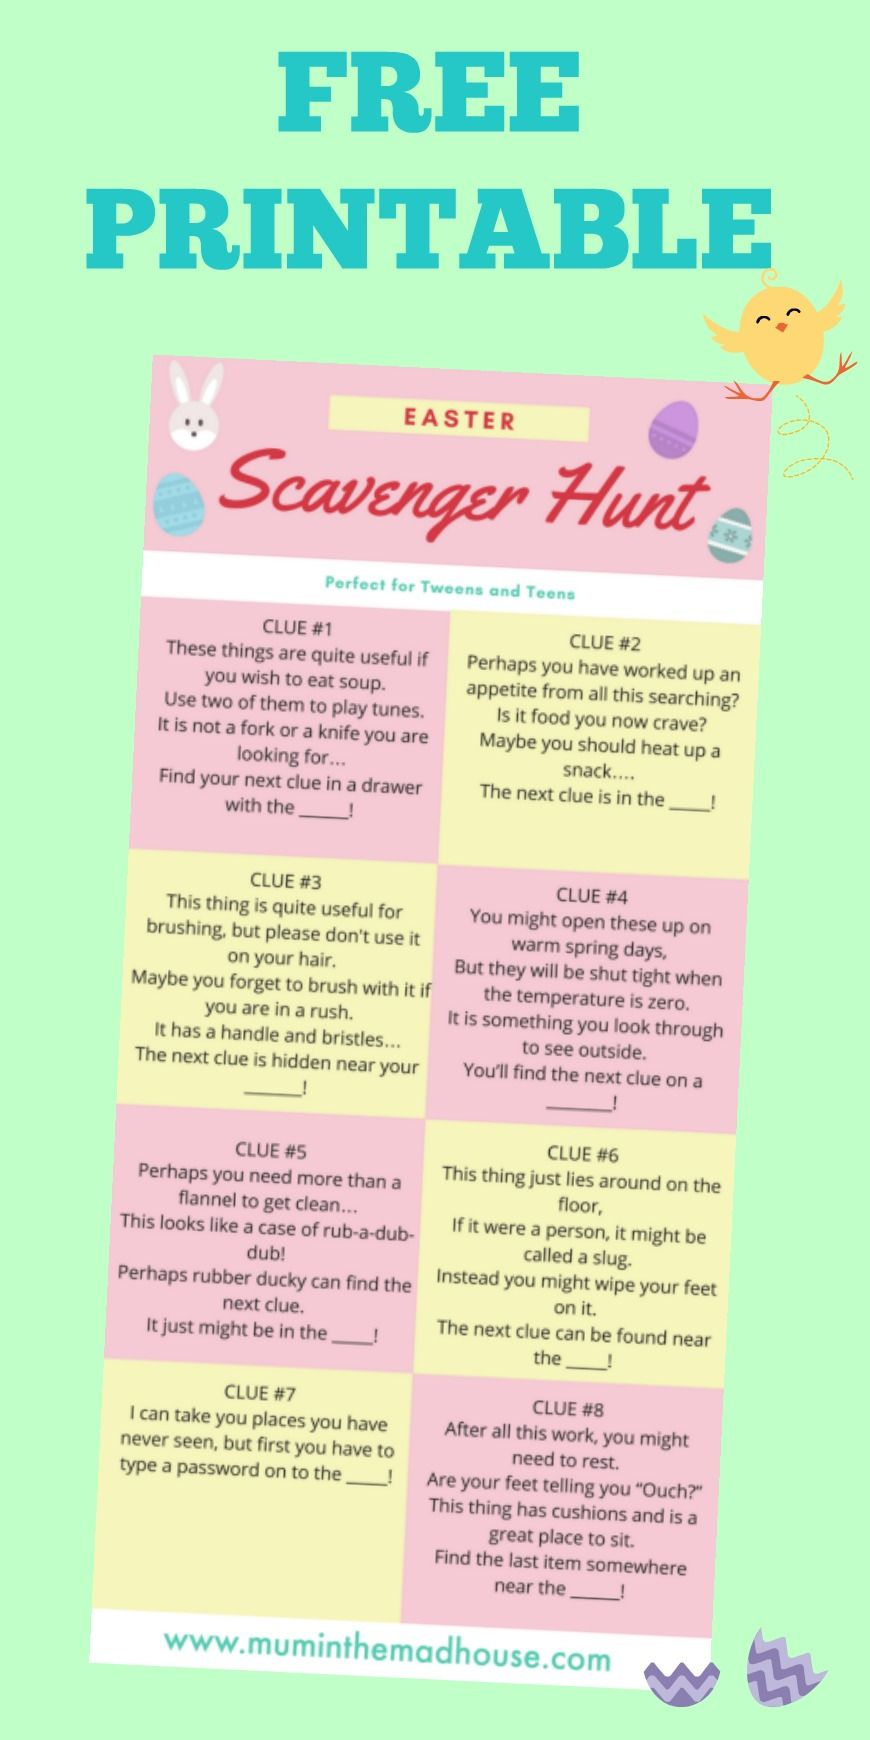 Easter Egg Hunts for Teenagers Easter scavenger hunt